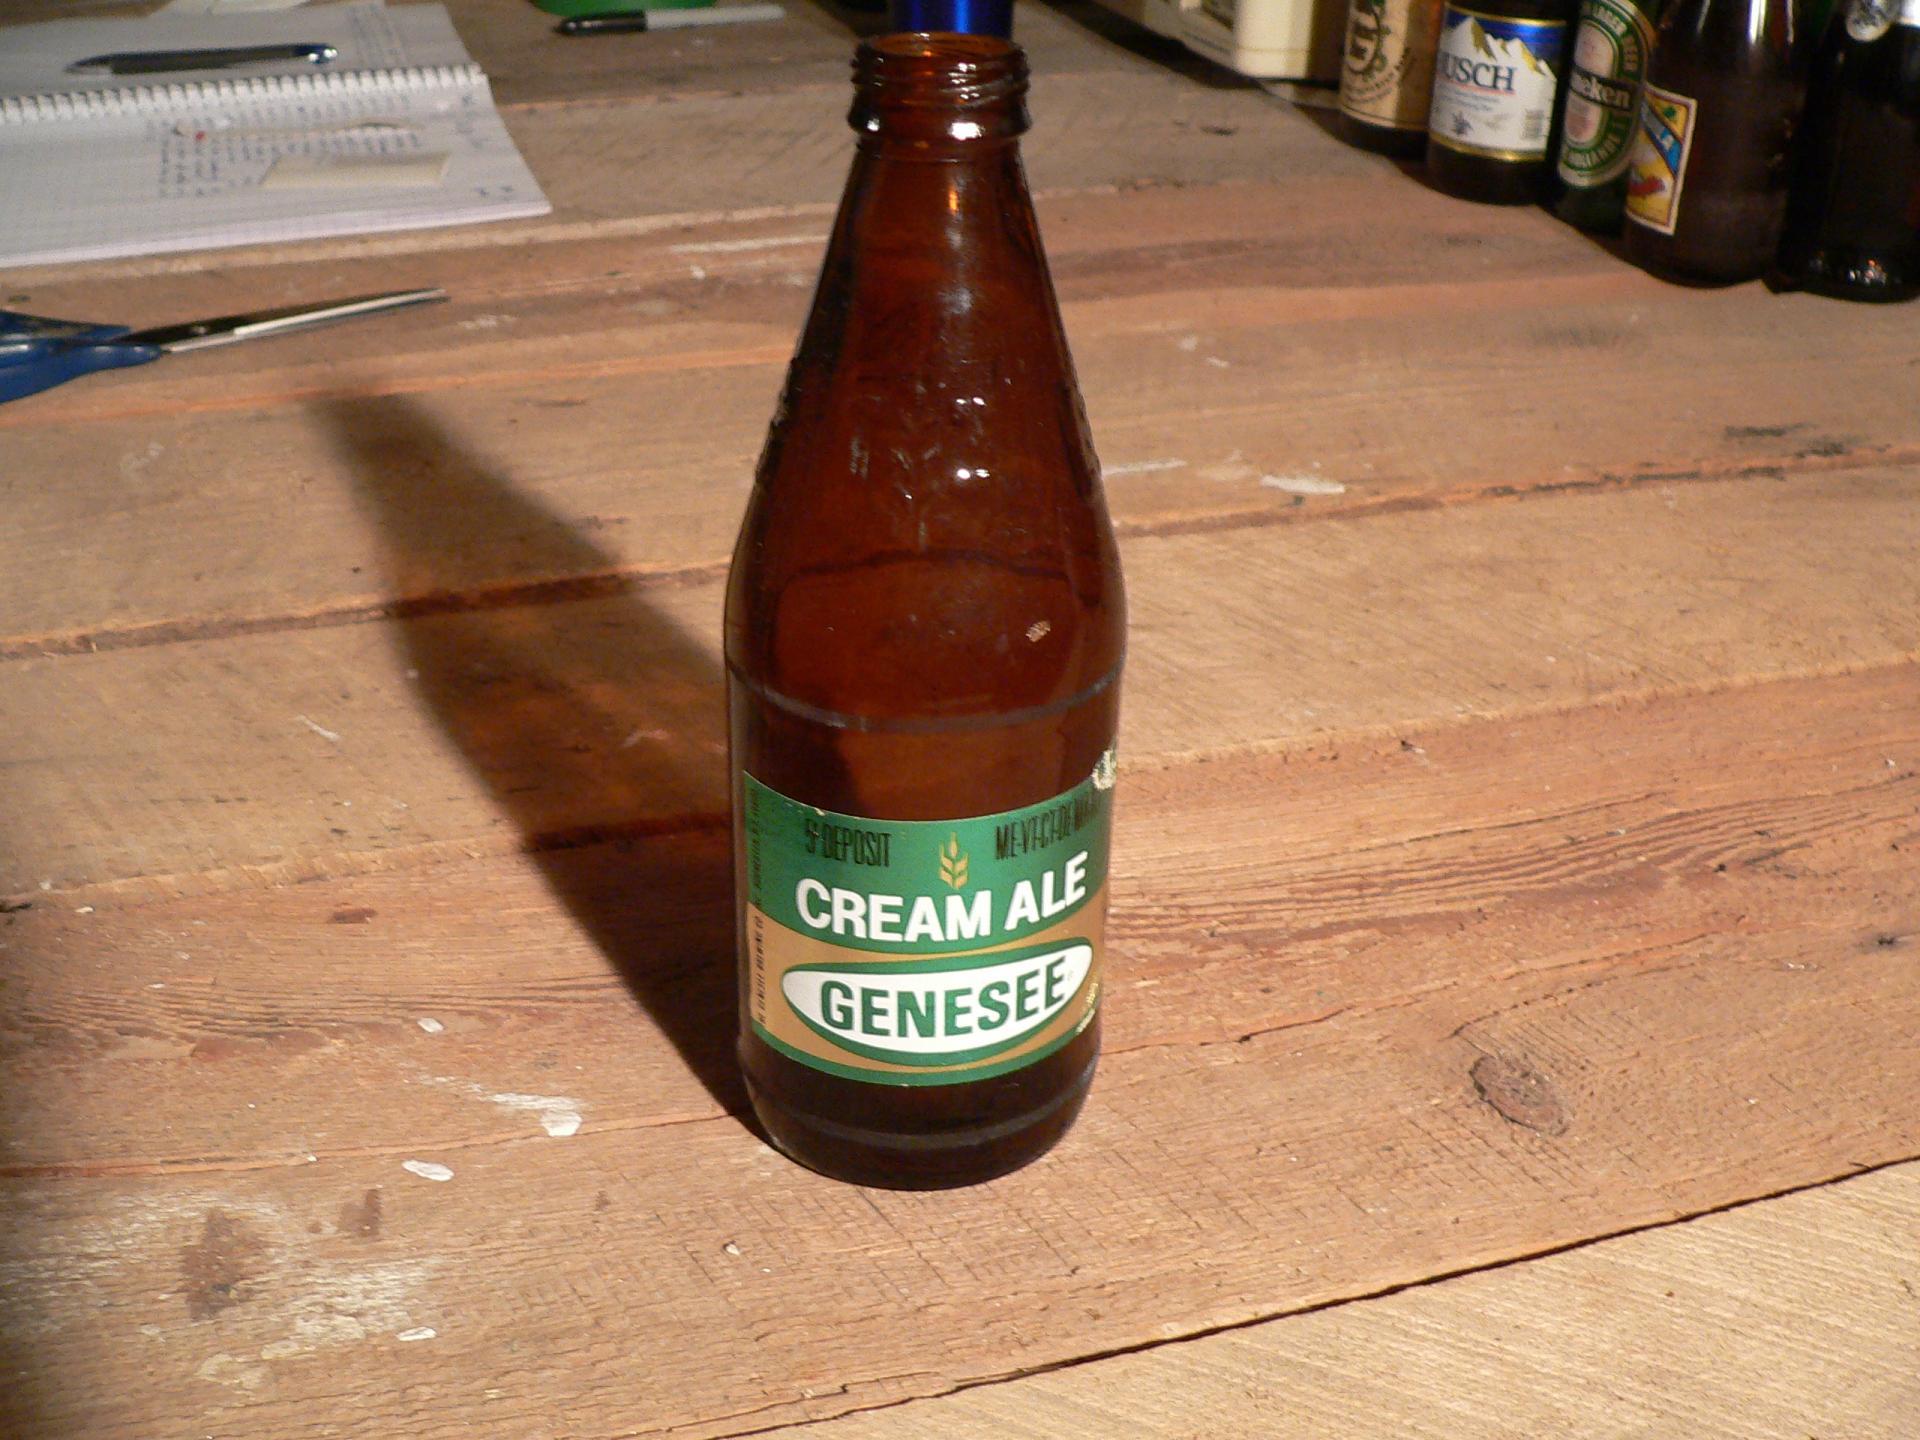 Biere genesee cream ale # 4739.58